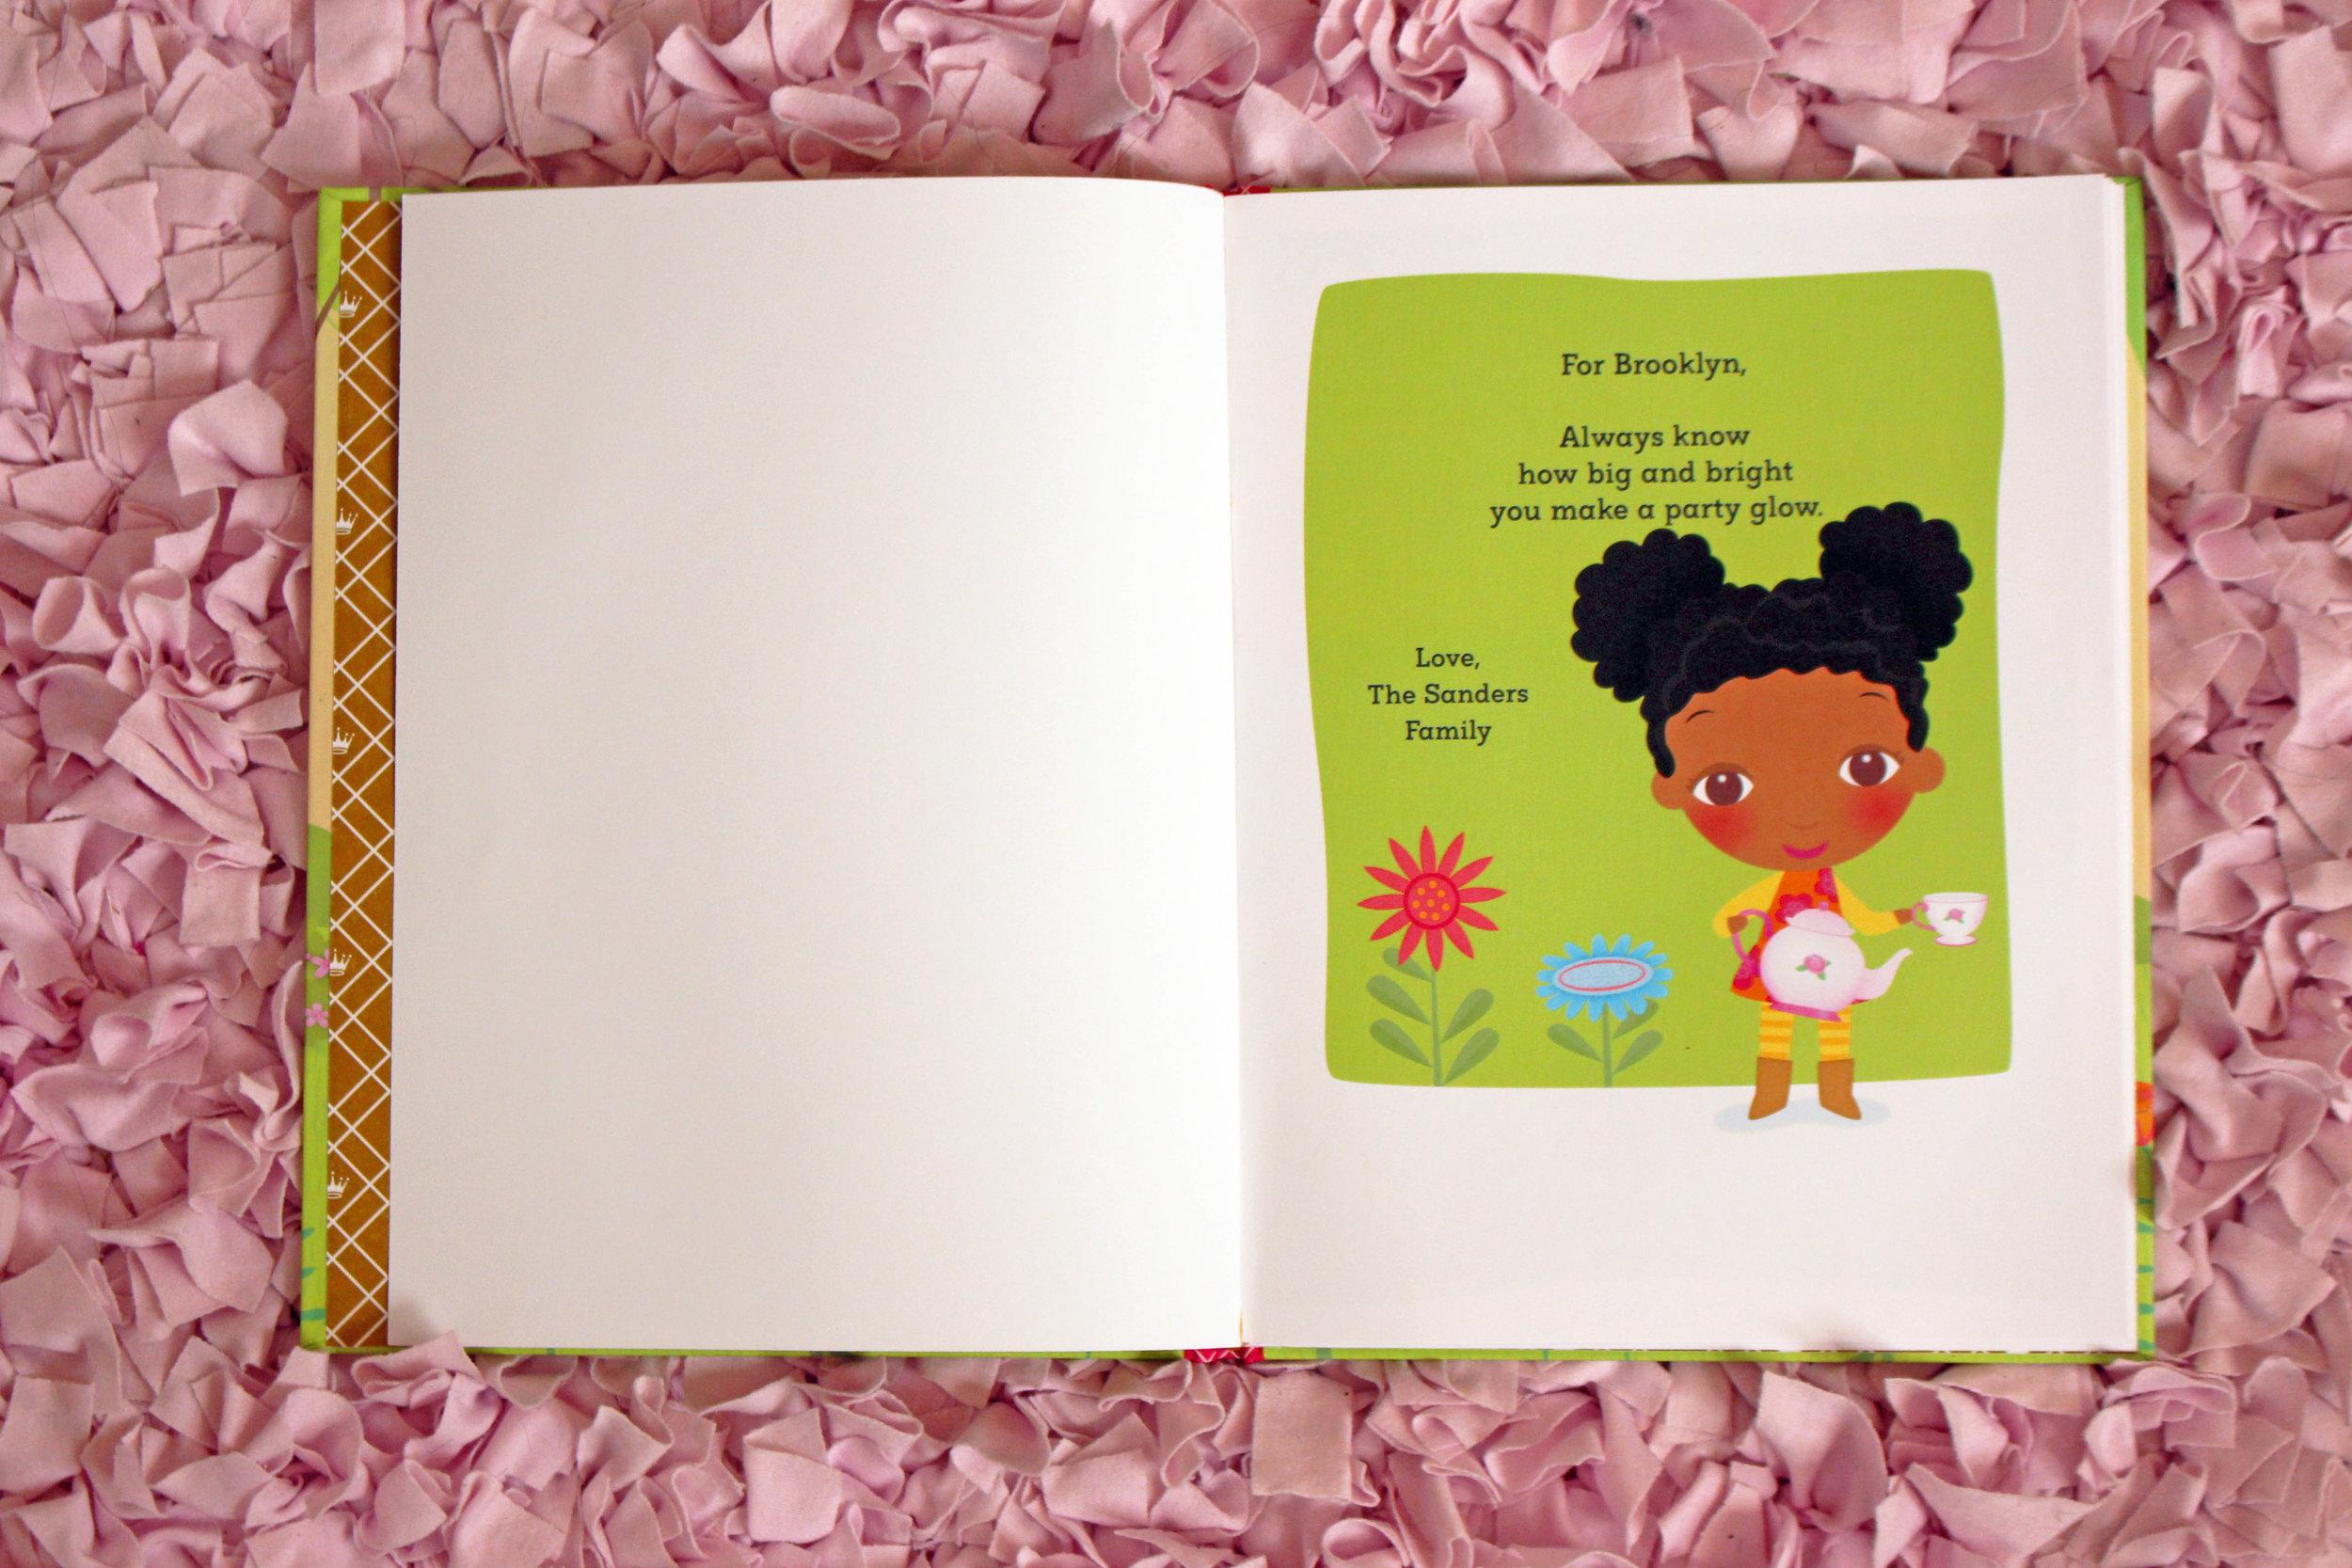 non-traditional baby gift ideas - personalized books | Pish Posh Perfect